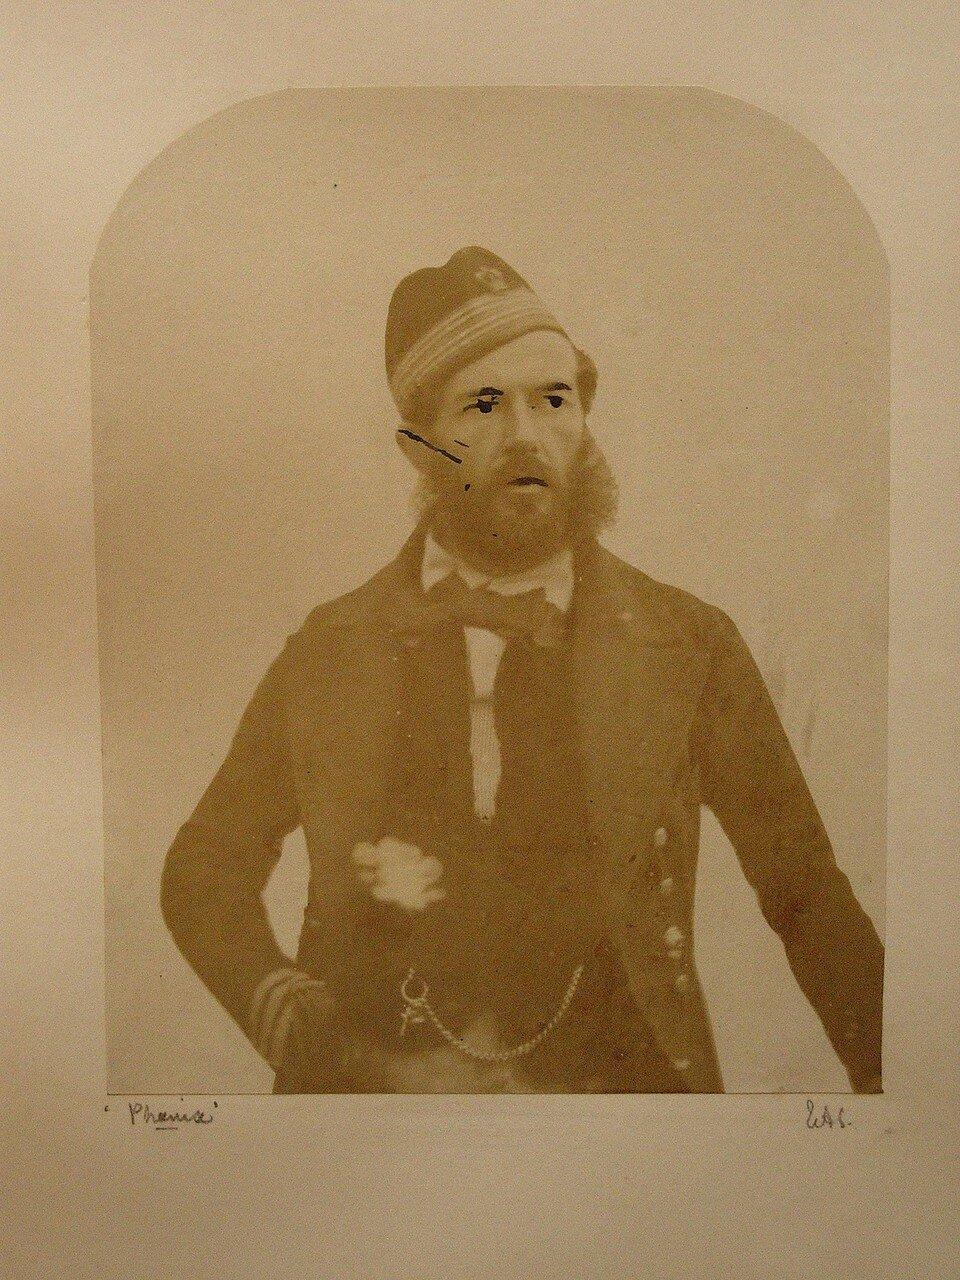 ������ ������ ���������� (27 ����� 1820, ������� - 4 �������� 1894, ������) � ���������� �������.